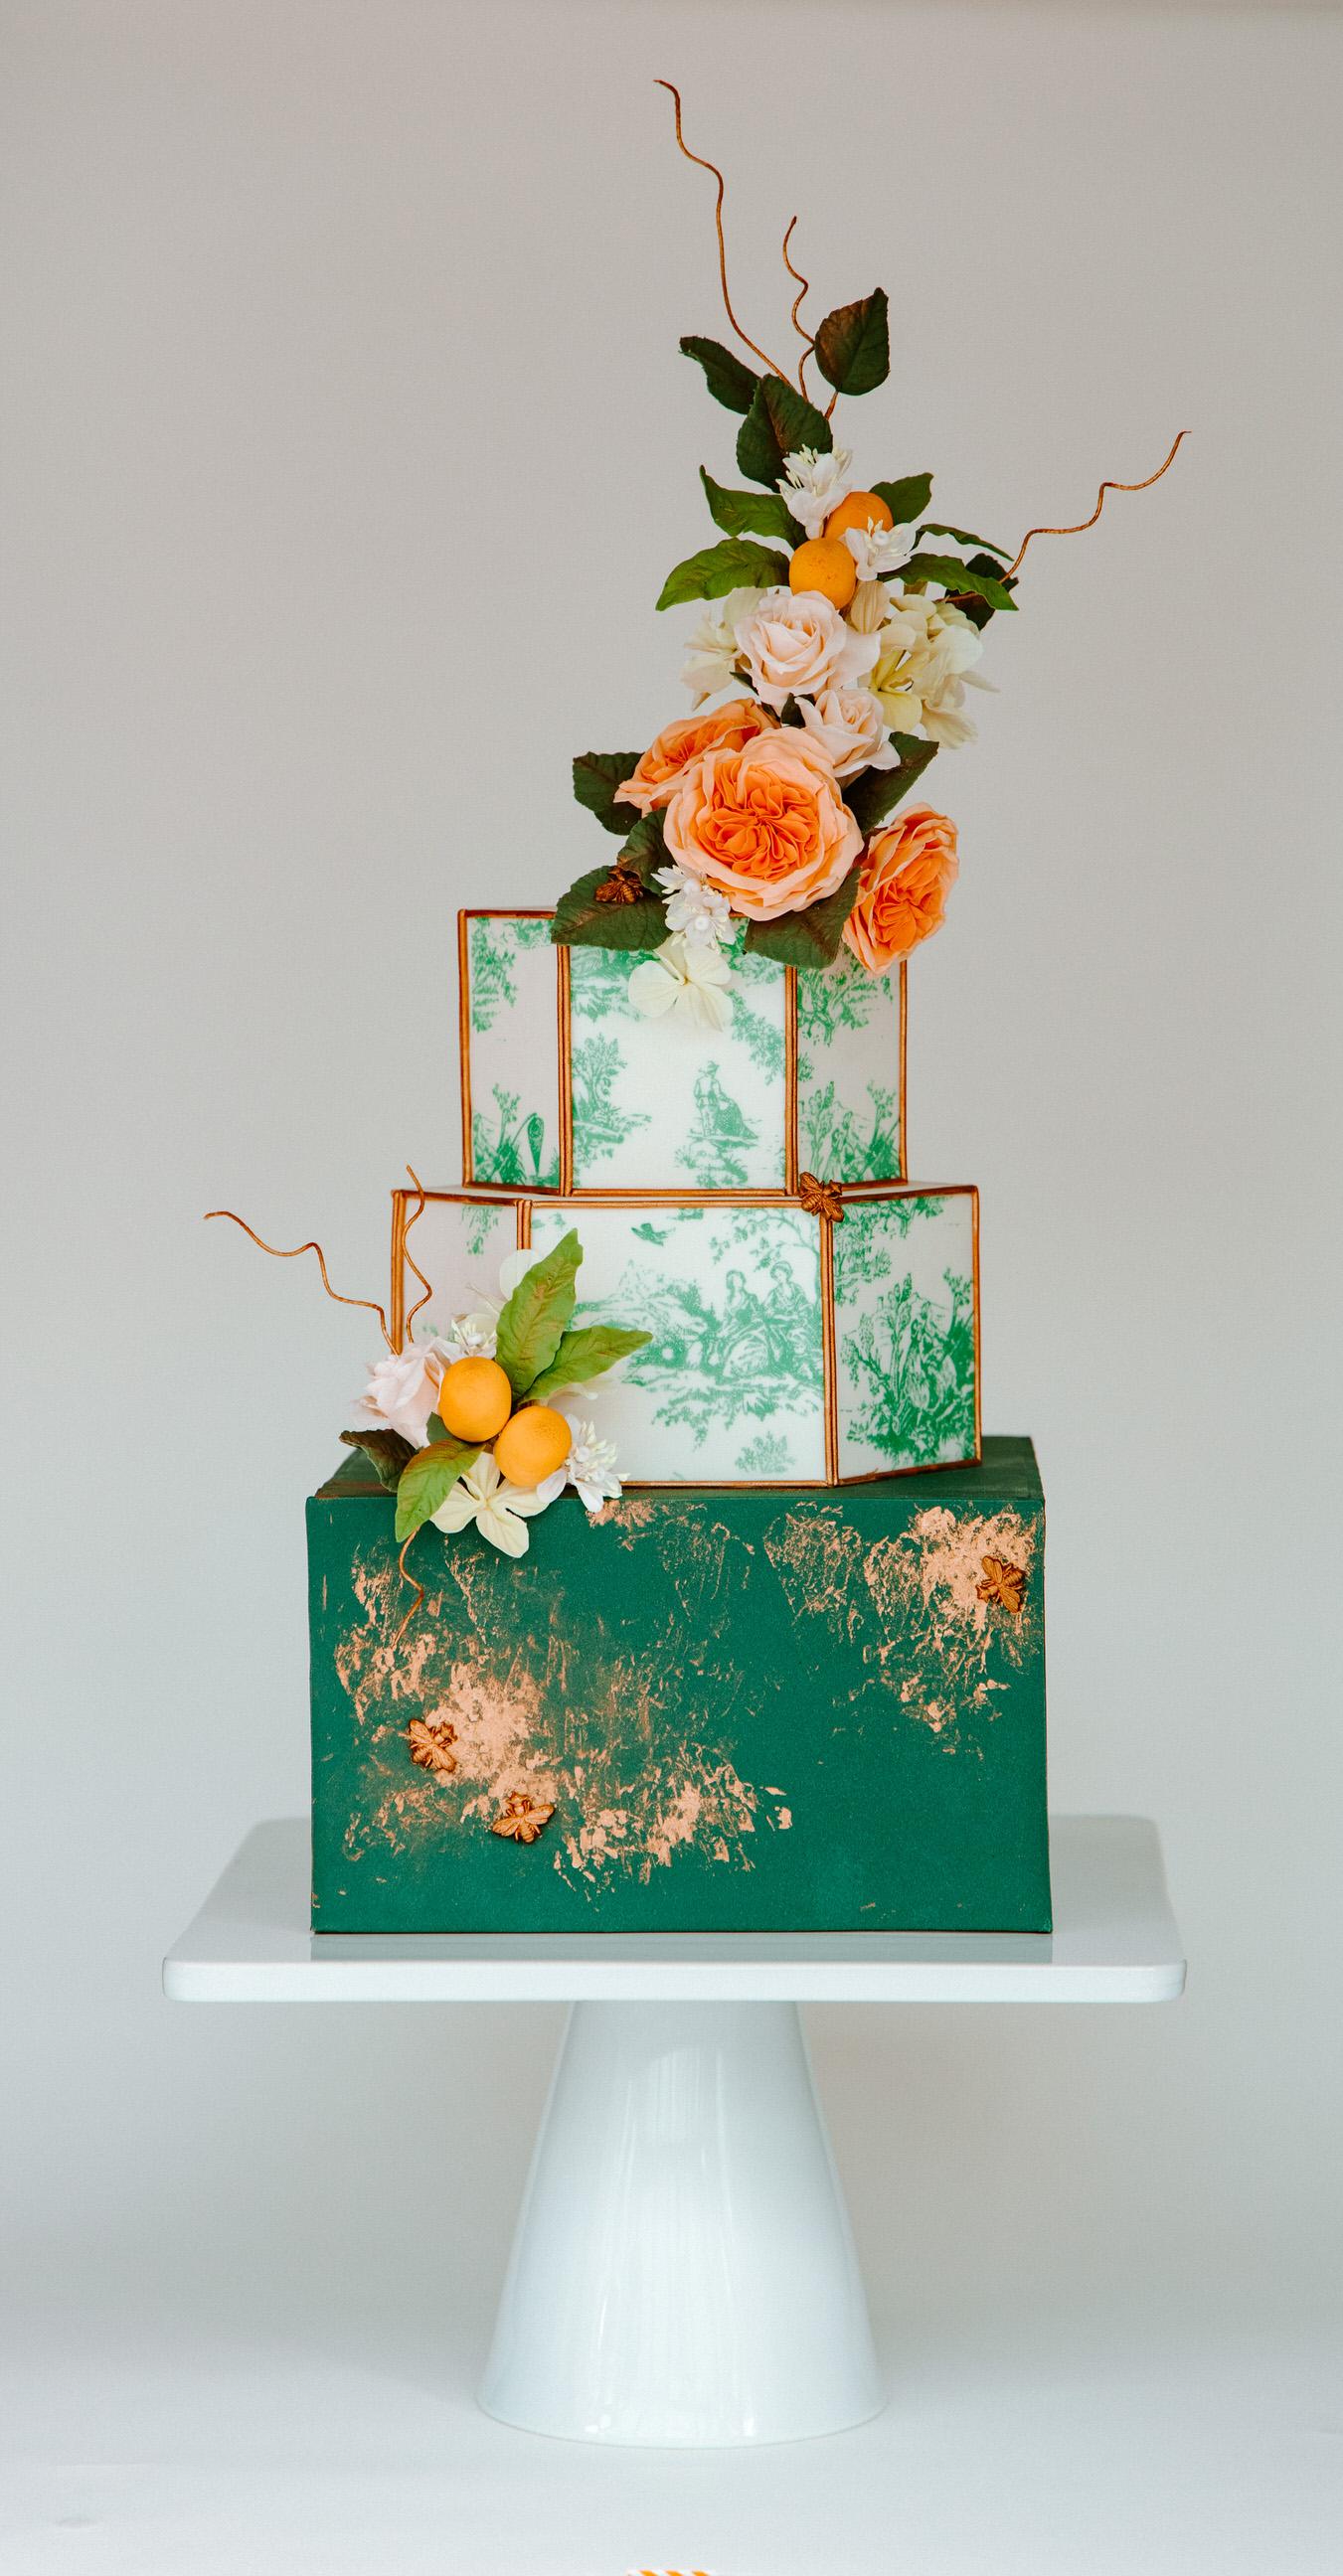 gateaux-cake-7368.jpg